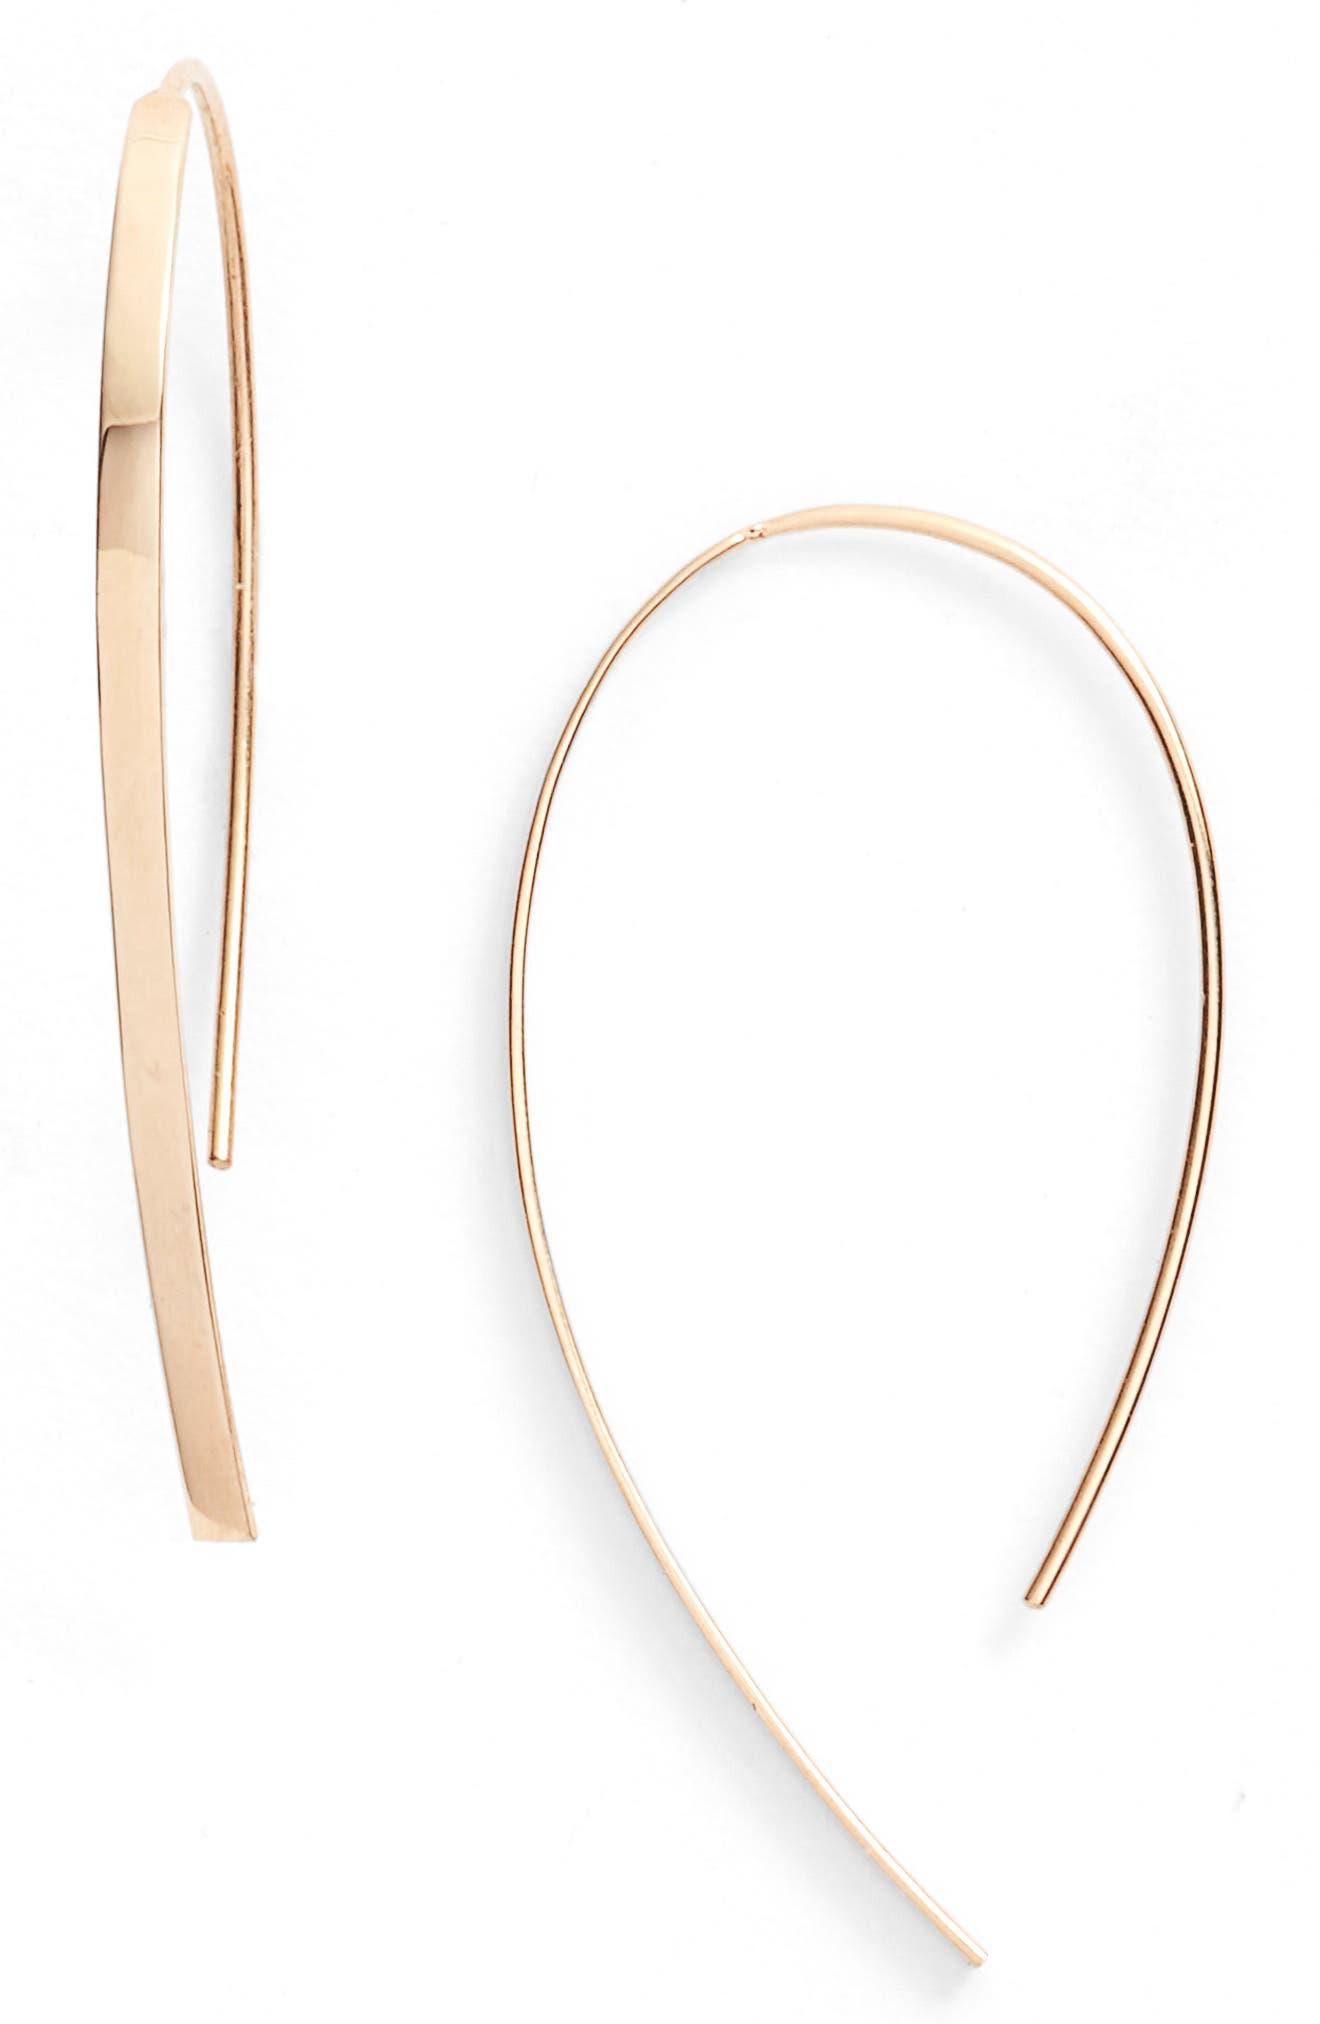 Main Image - Lana Jewelry Mini Flat Hooked On Hoop Earrings